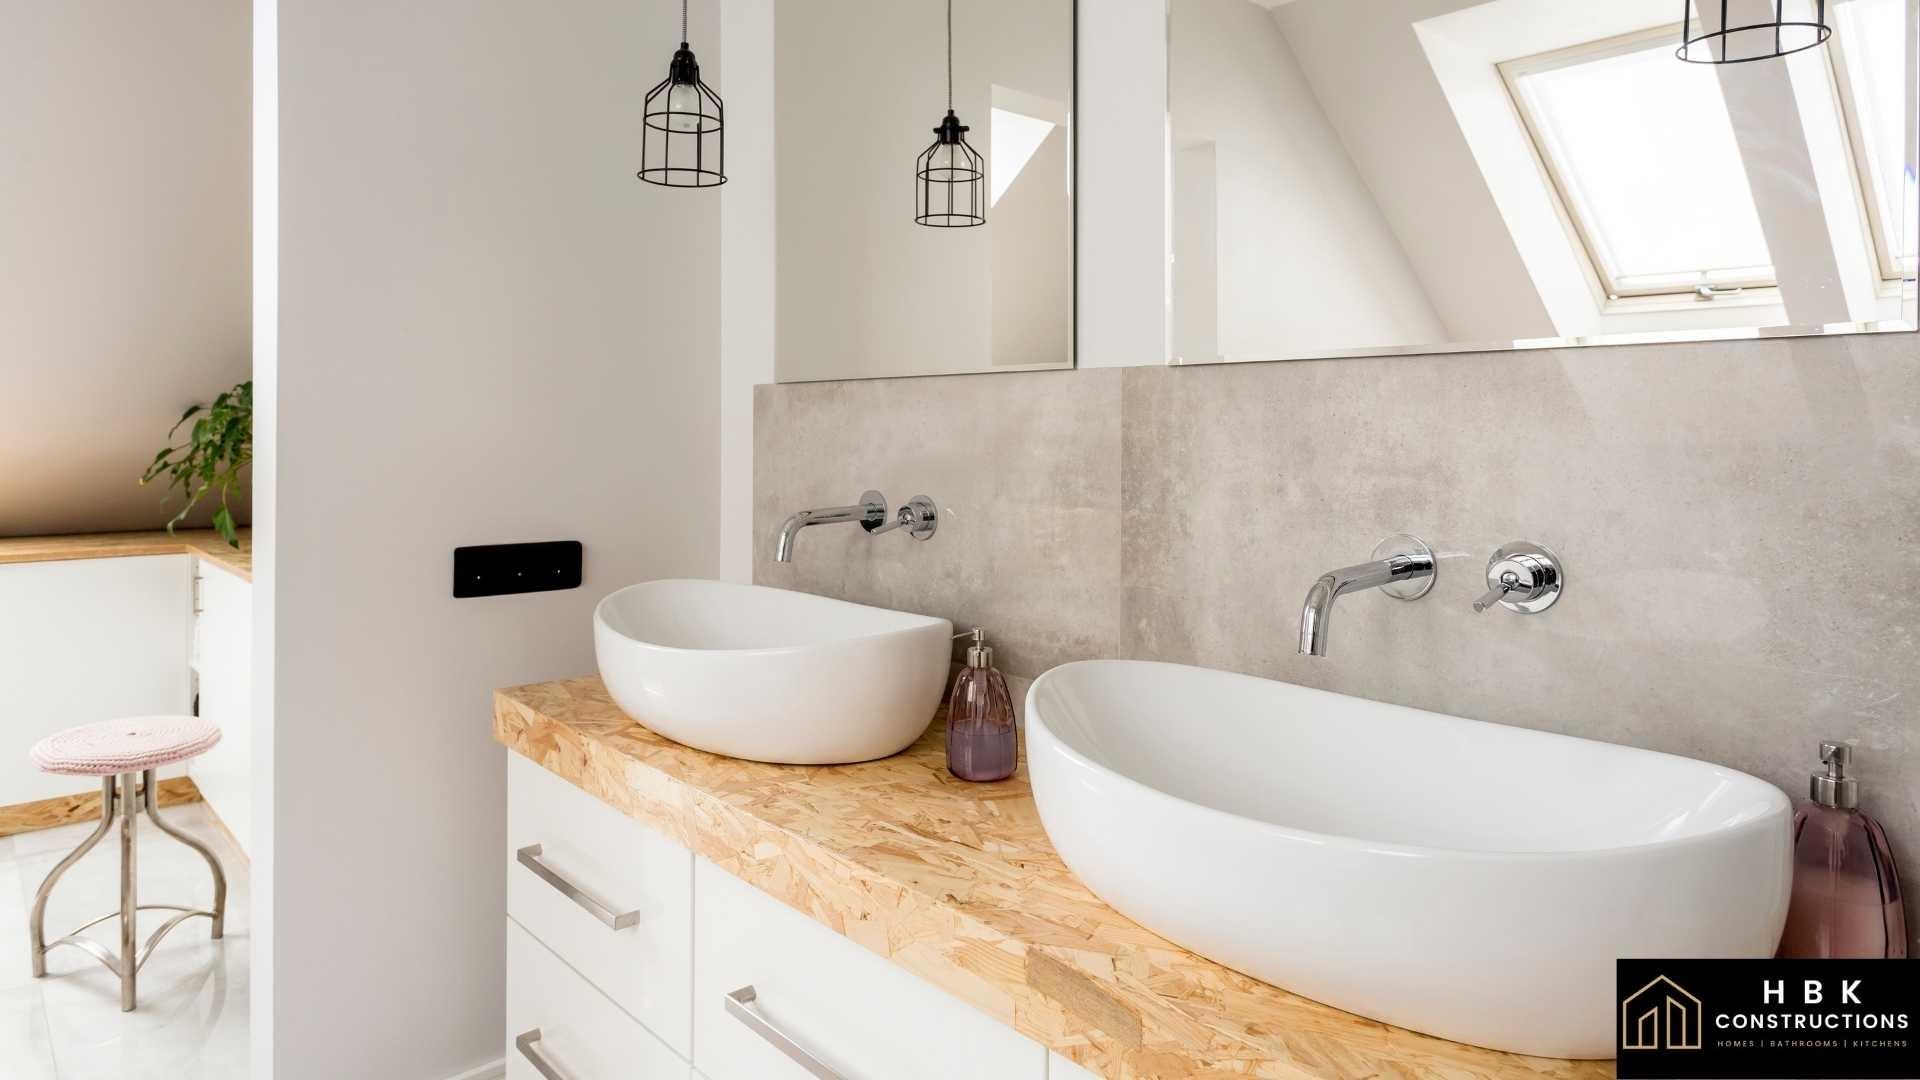 HBK Constructions – Home, Bathroom & Kitchen Renov (@hbkgroupmelbourne) Cover Image